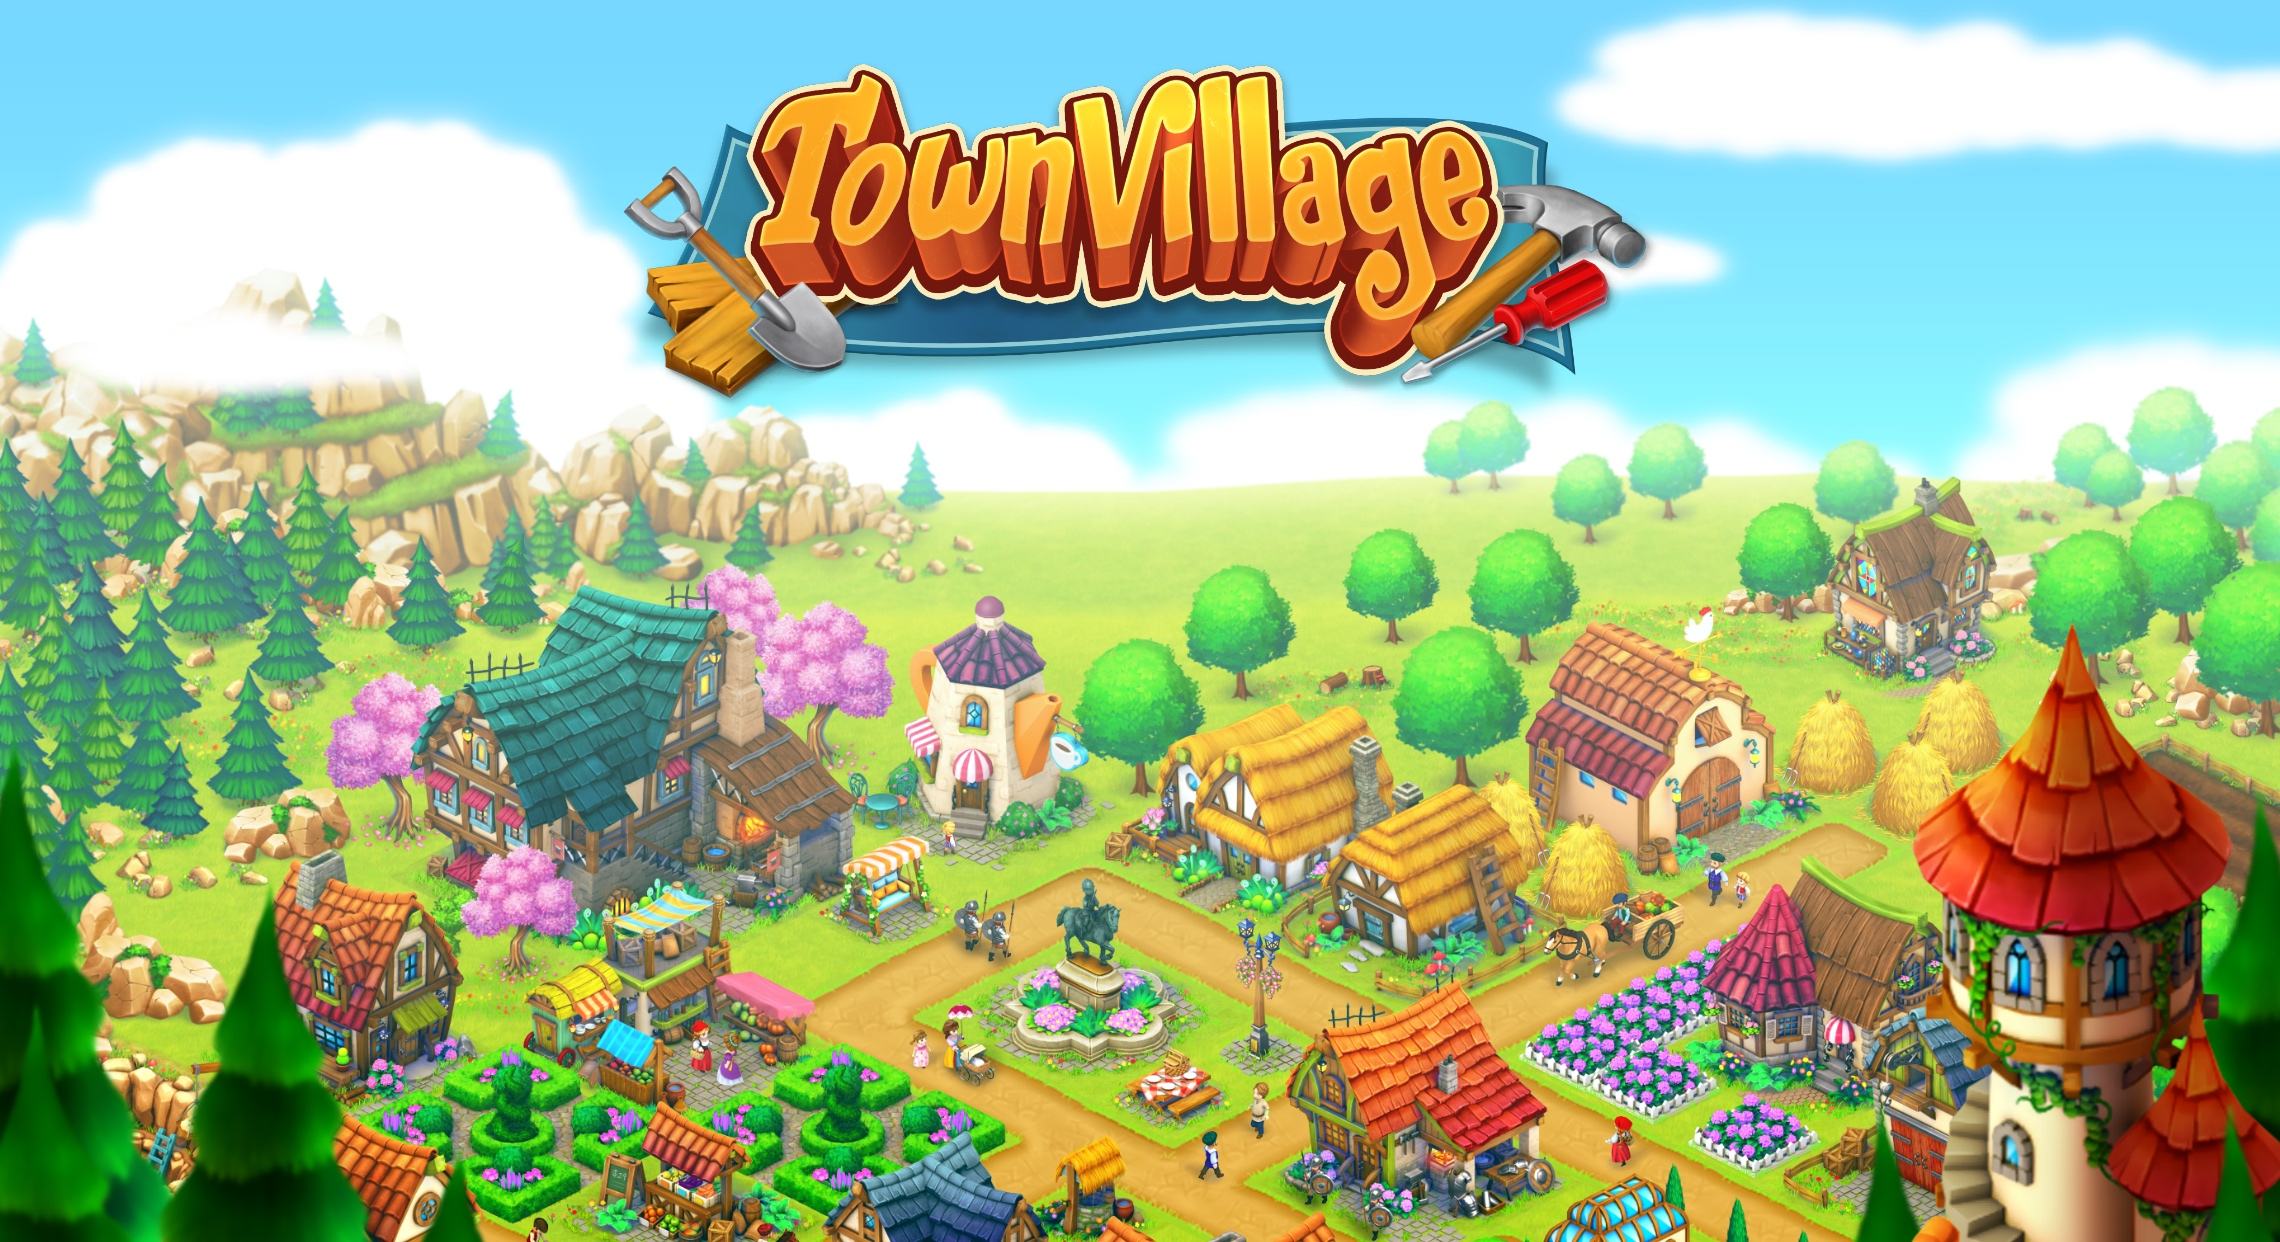 TownVillage: Farm, Build, Trade!